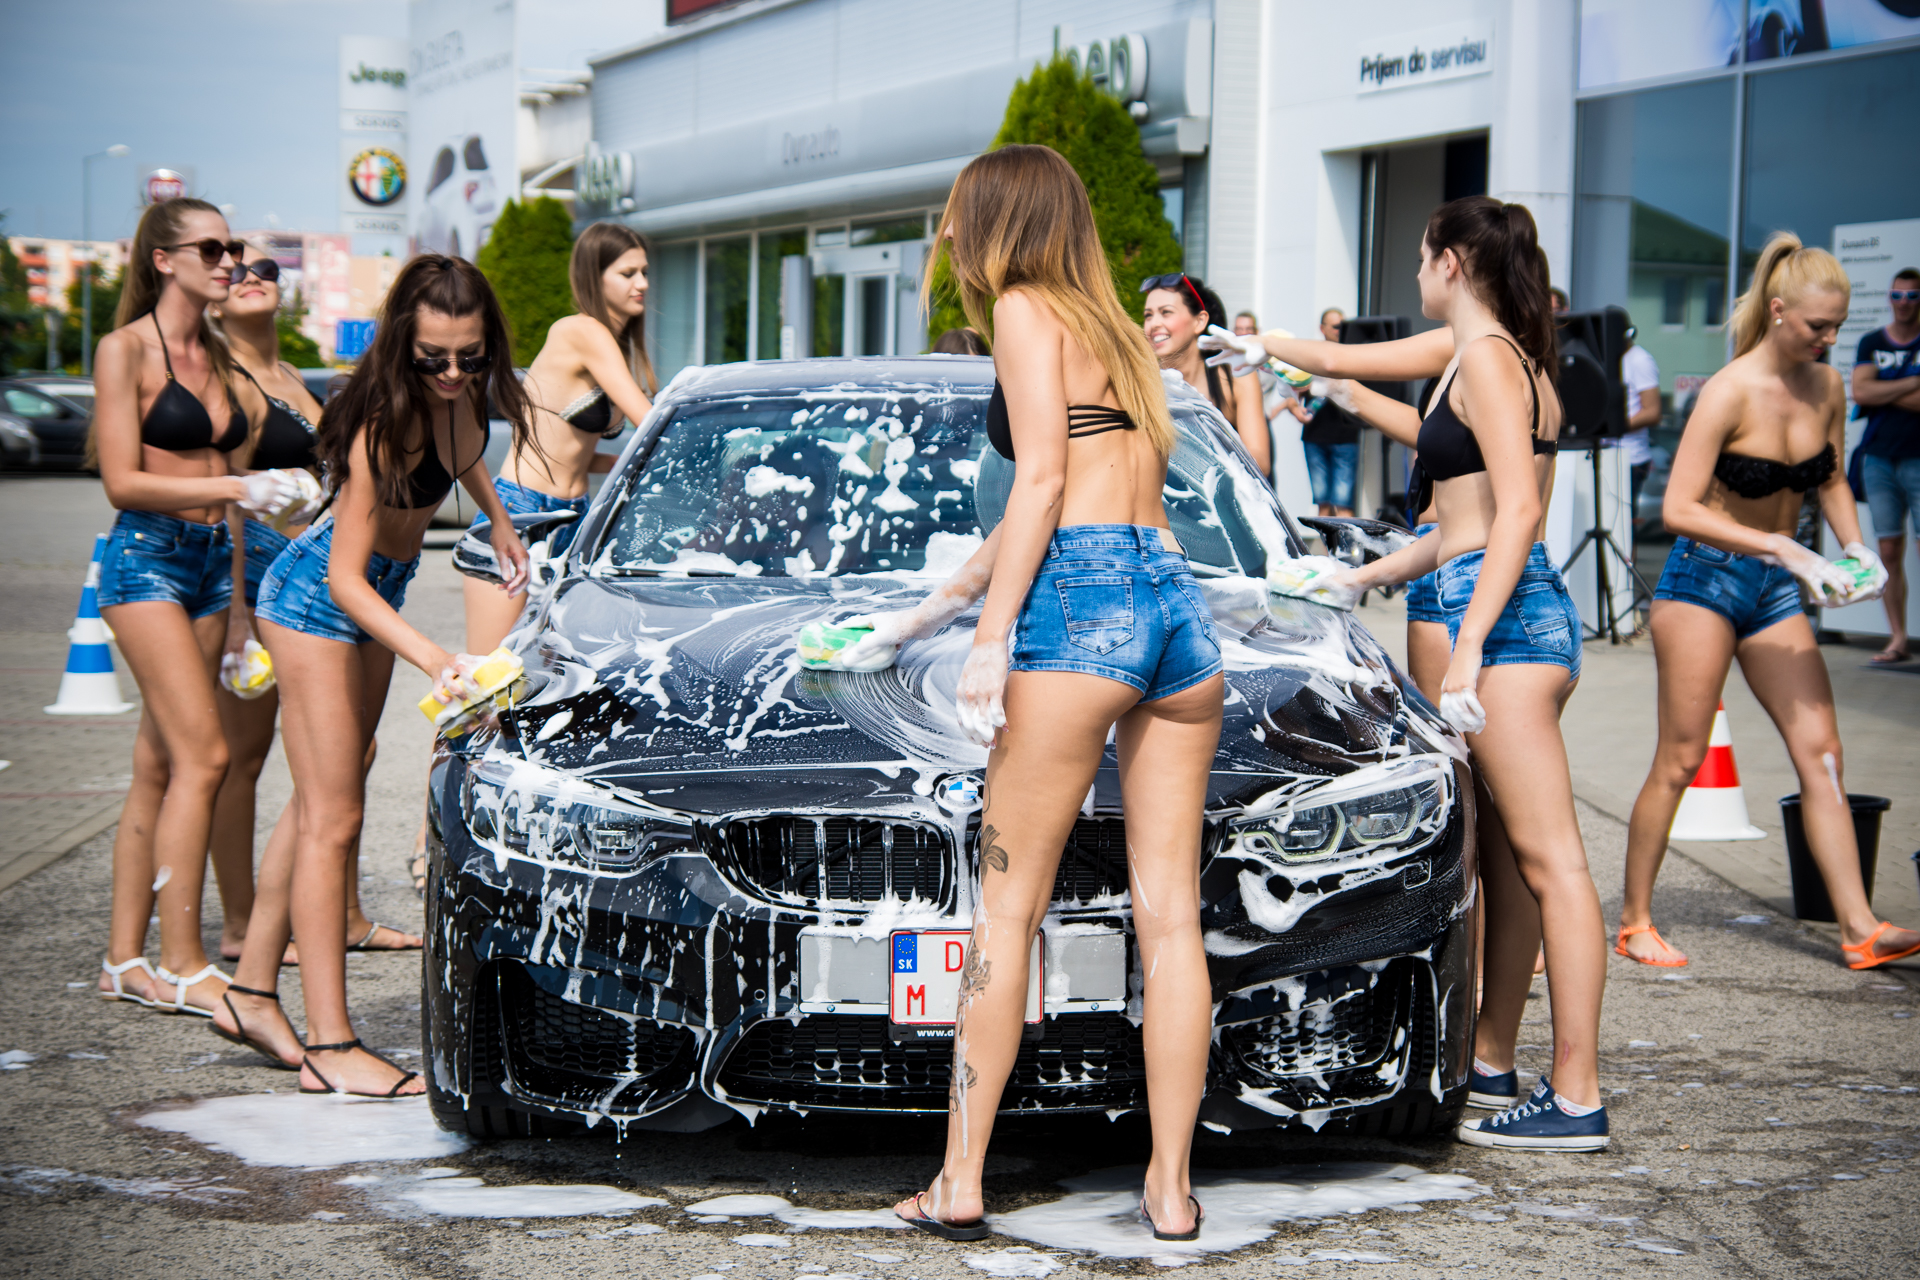 girl-masterbates-in-car-wash-video